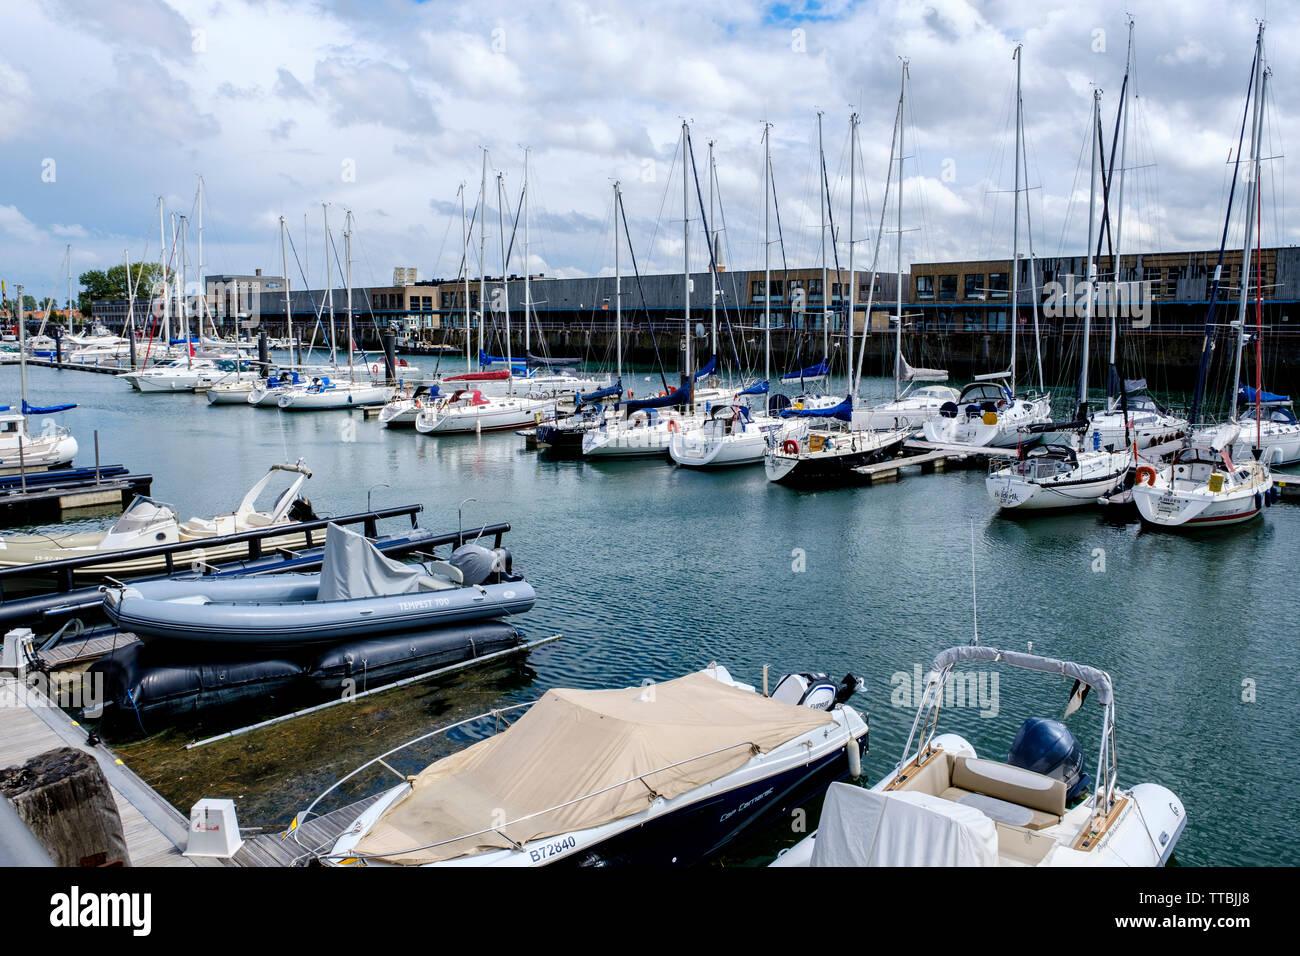 The yachting marina in Zeebrugge, Belgium - Stock Image